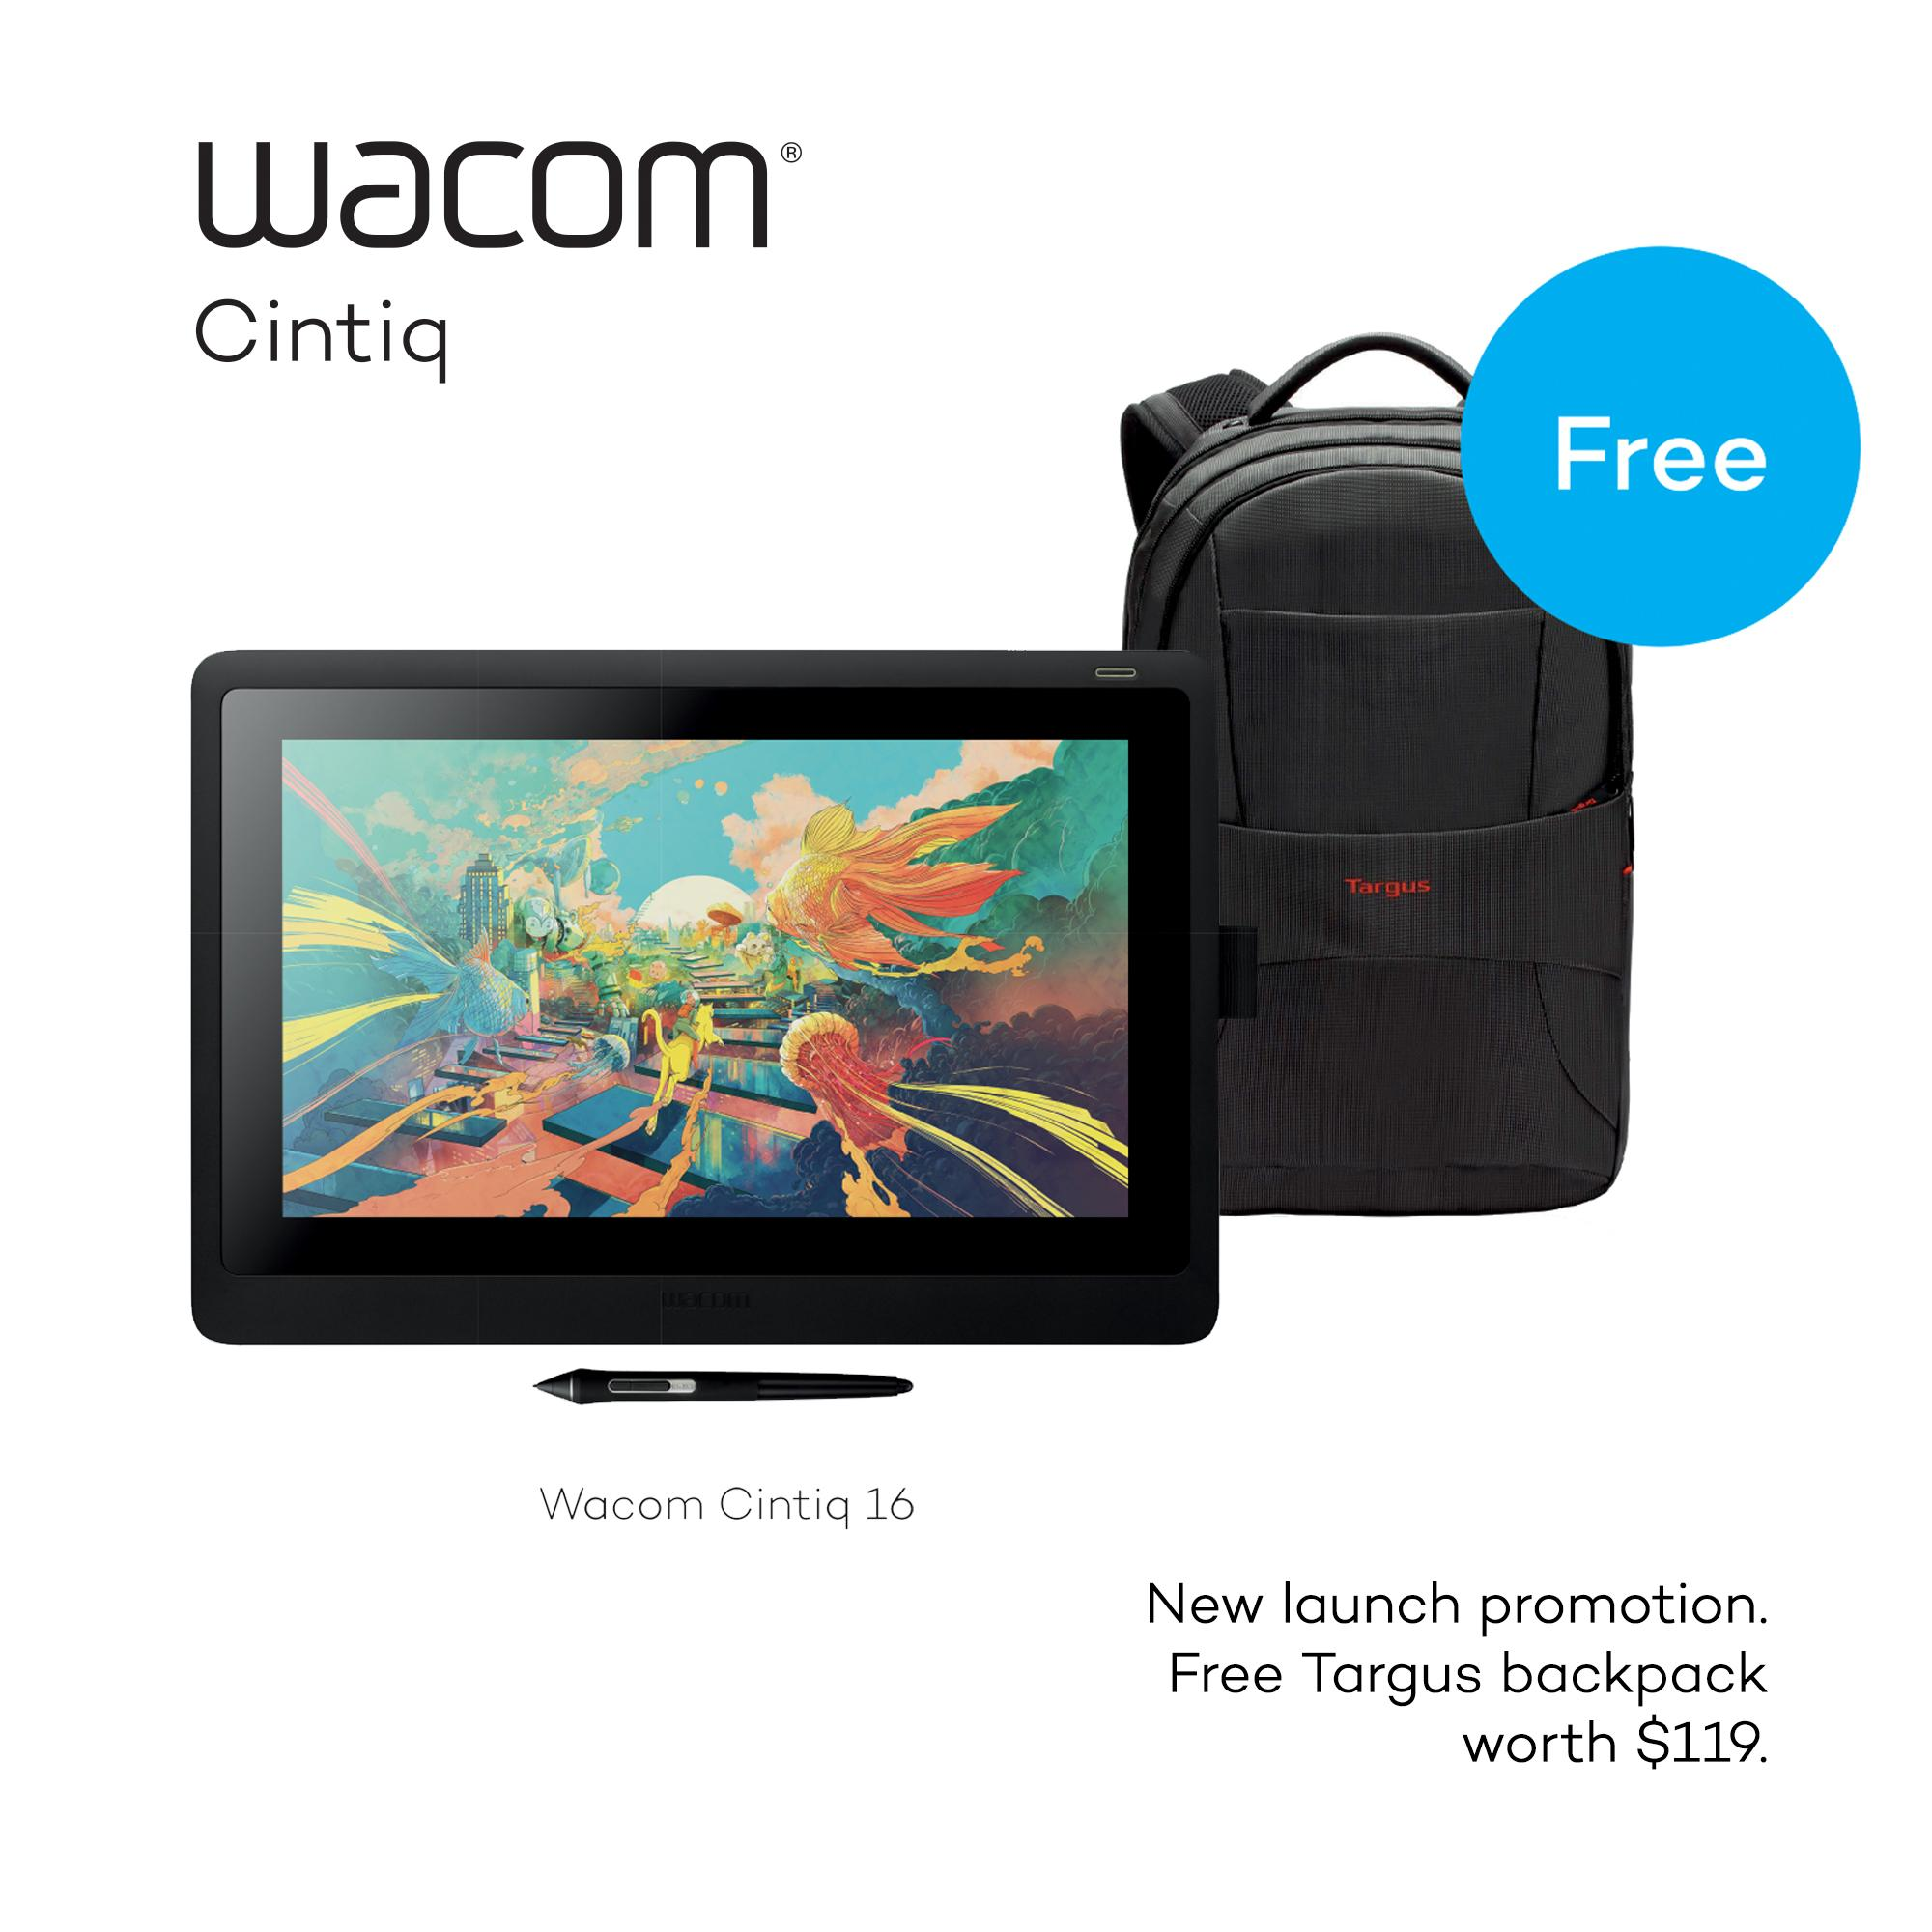 (NEW MODEL) Wacom Cintiq 16